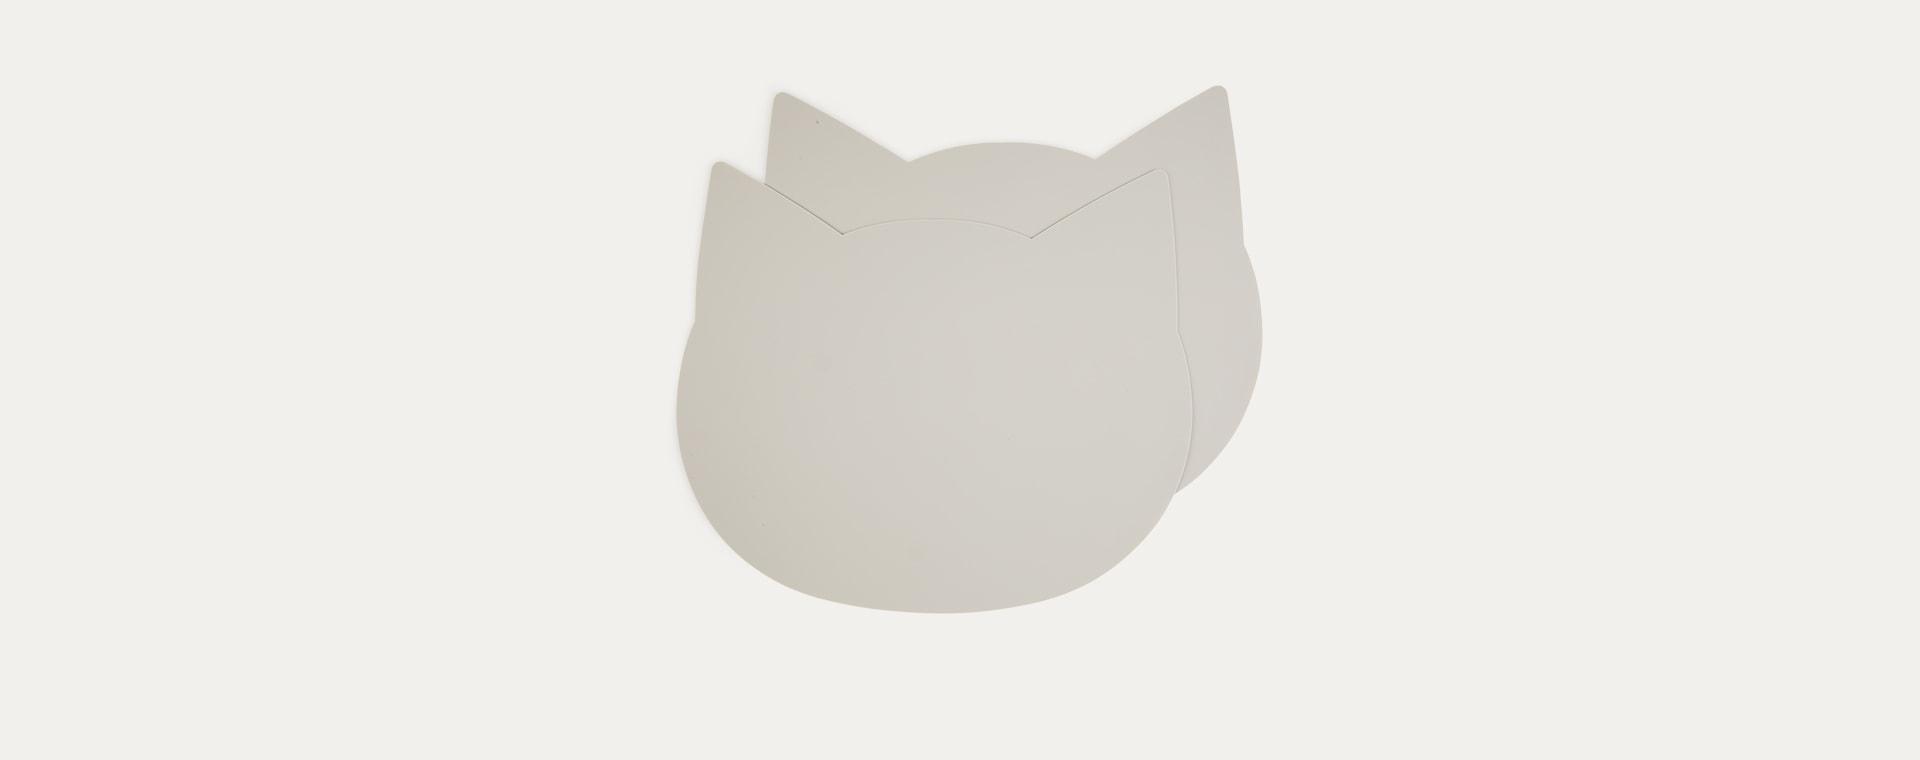 Cat Sandy Liewood 2-Pack Gada Placemats